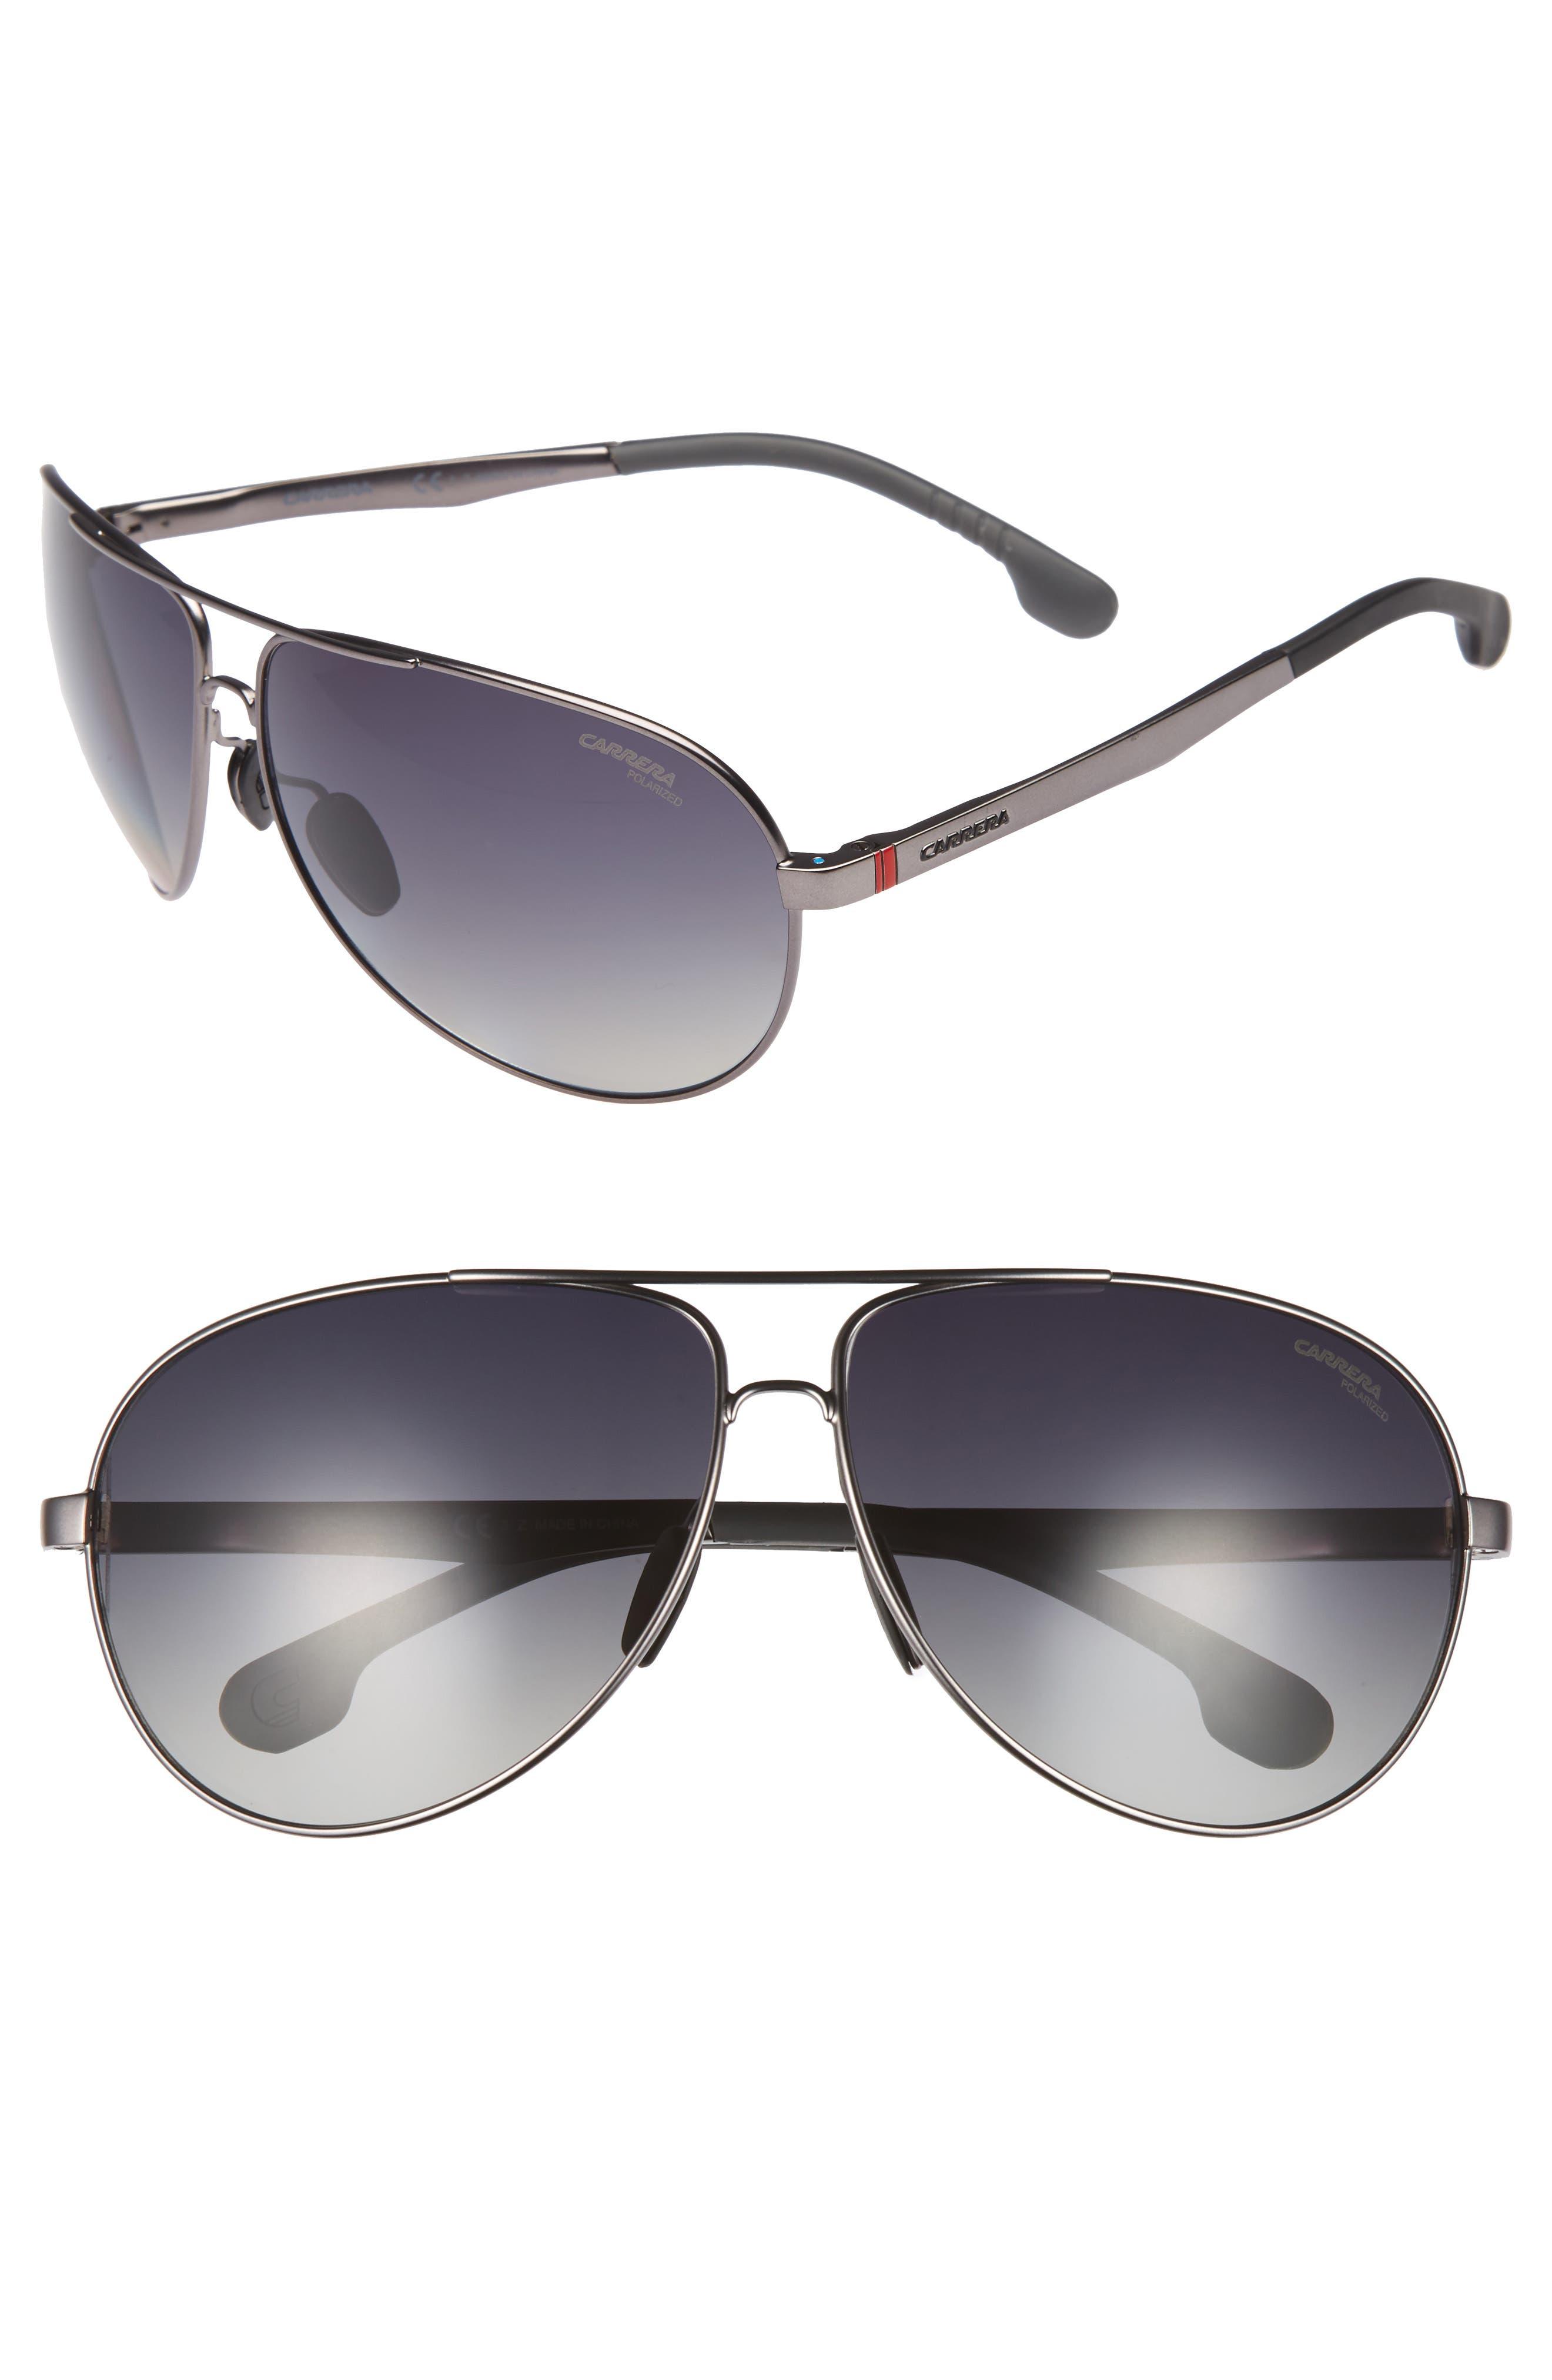 66mm Polarized Sunglasses,                         Main,                         color, Matte Dark Ruthenium